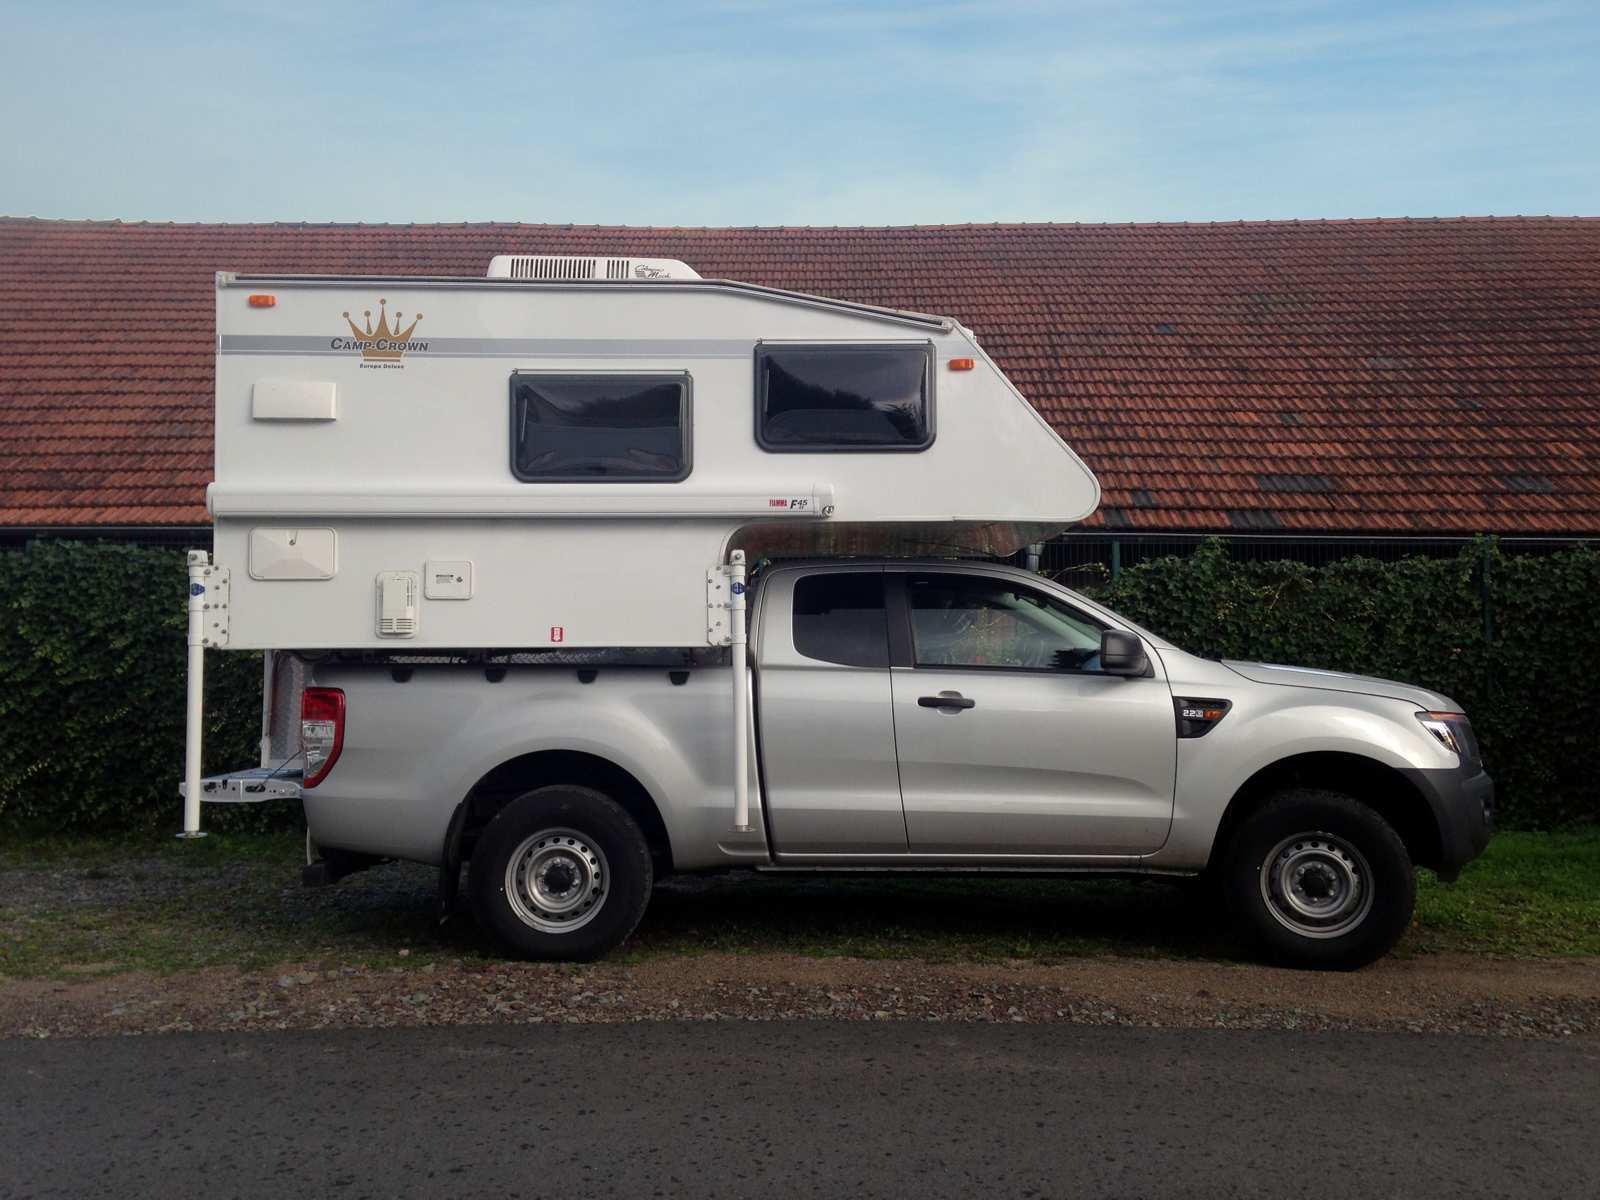 Ford Ranger XLT Extrakabine mit Camp-Crown Europa Deluxe